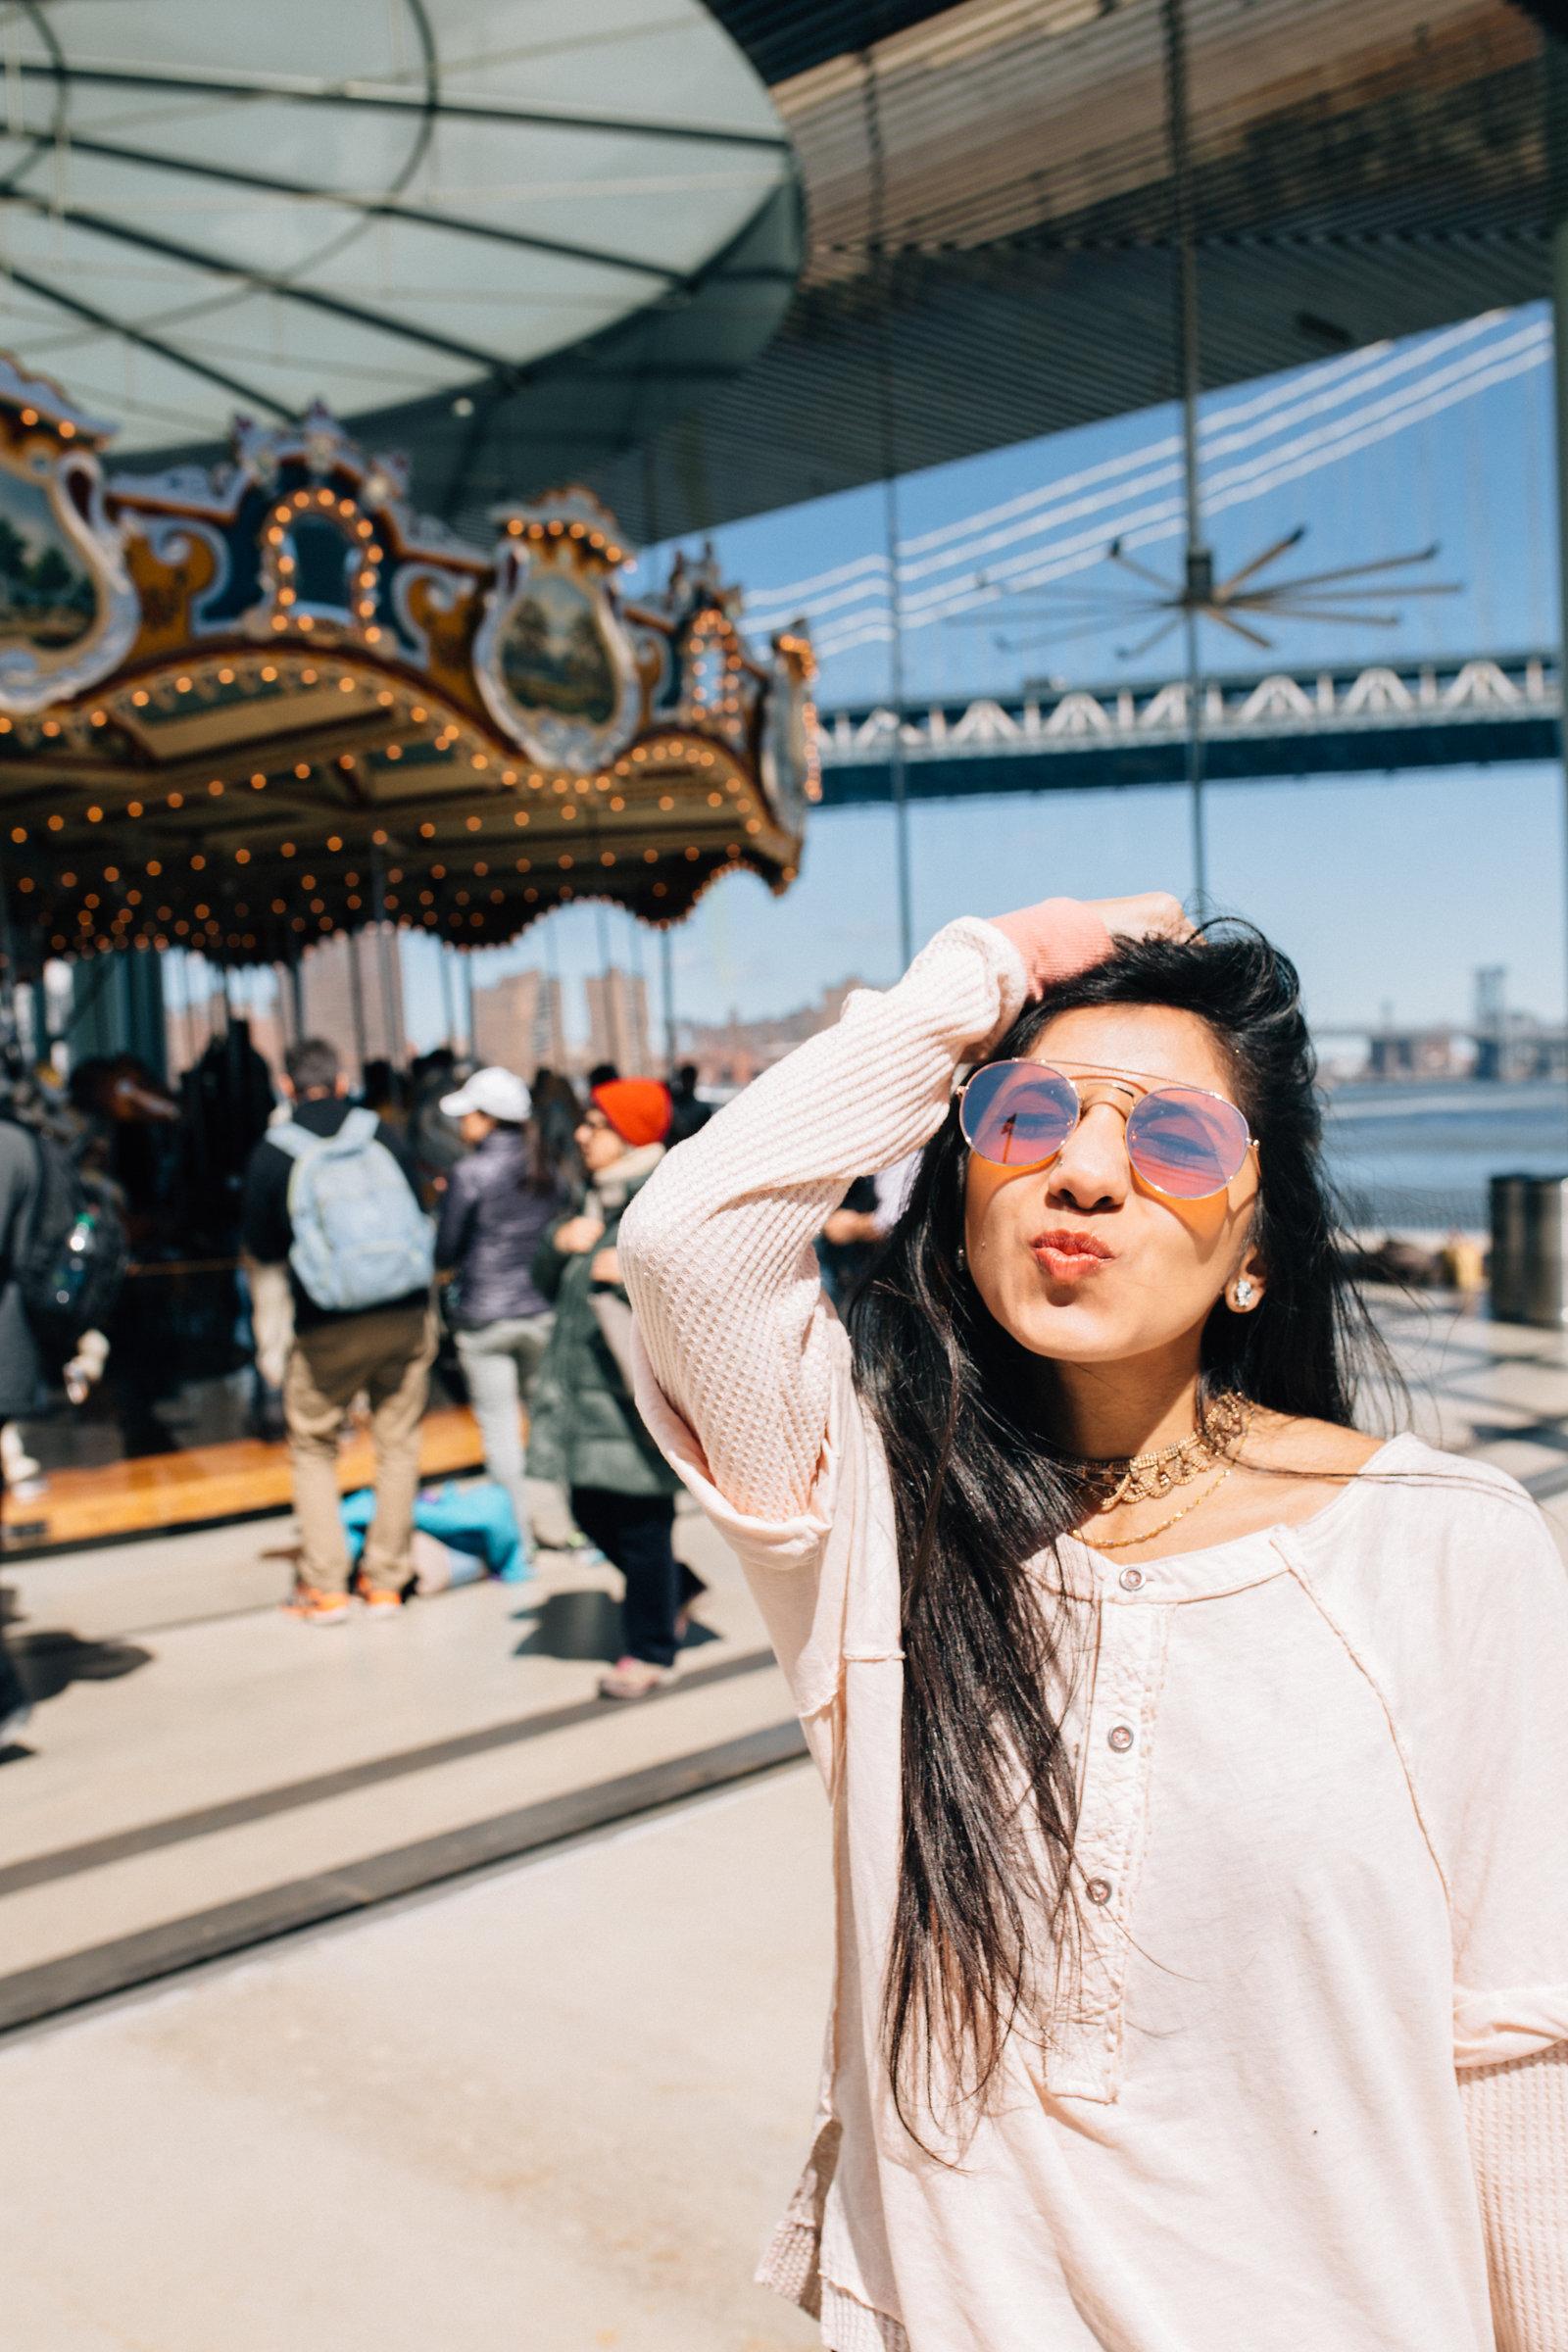 dreamy.BrooklynBridgePark.Carousel.FreePeople.fashionblogger.comfy.newyork